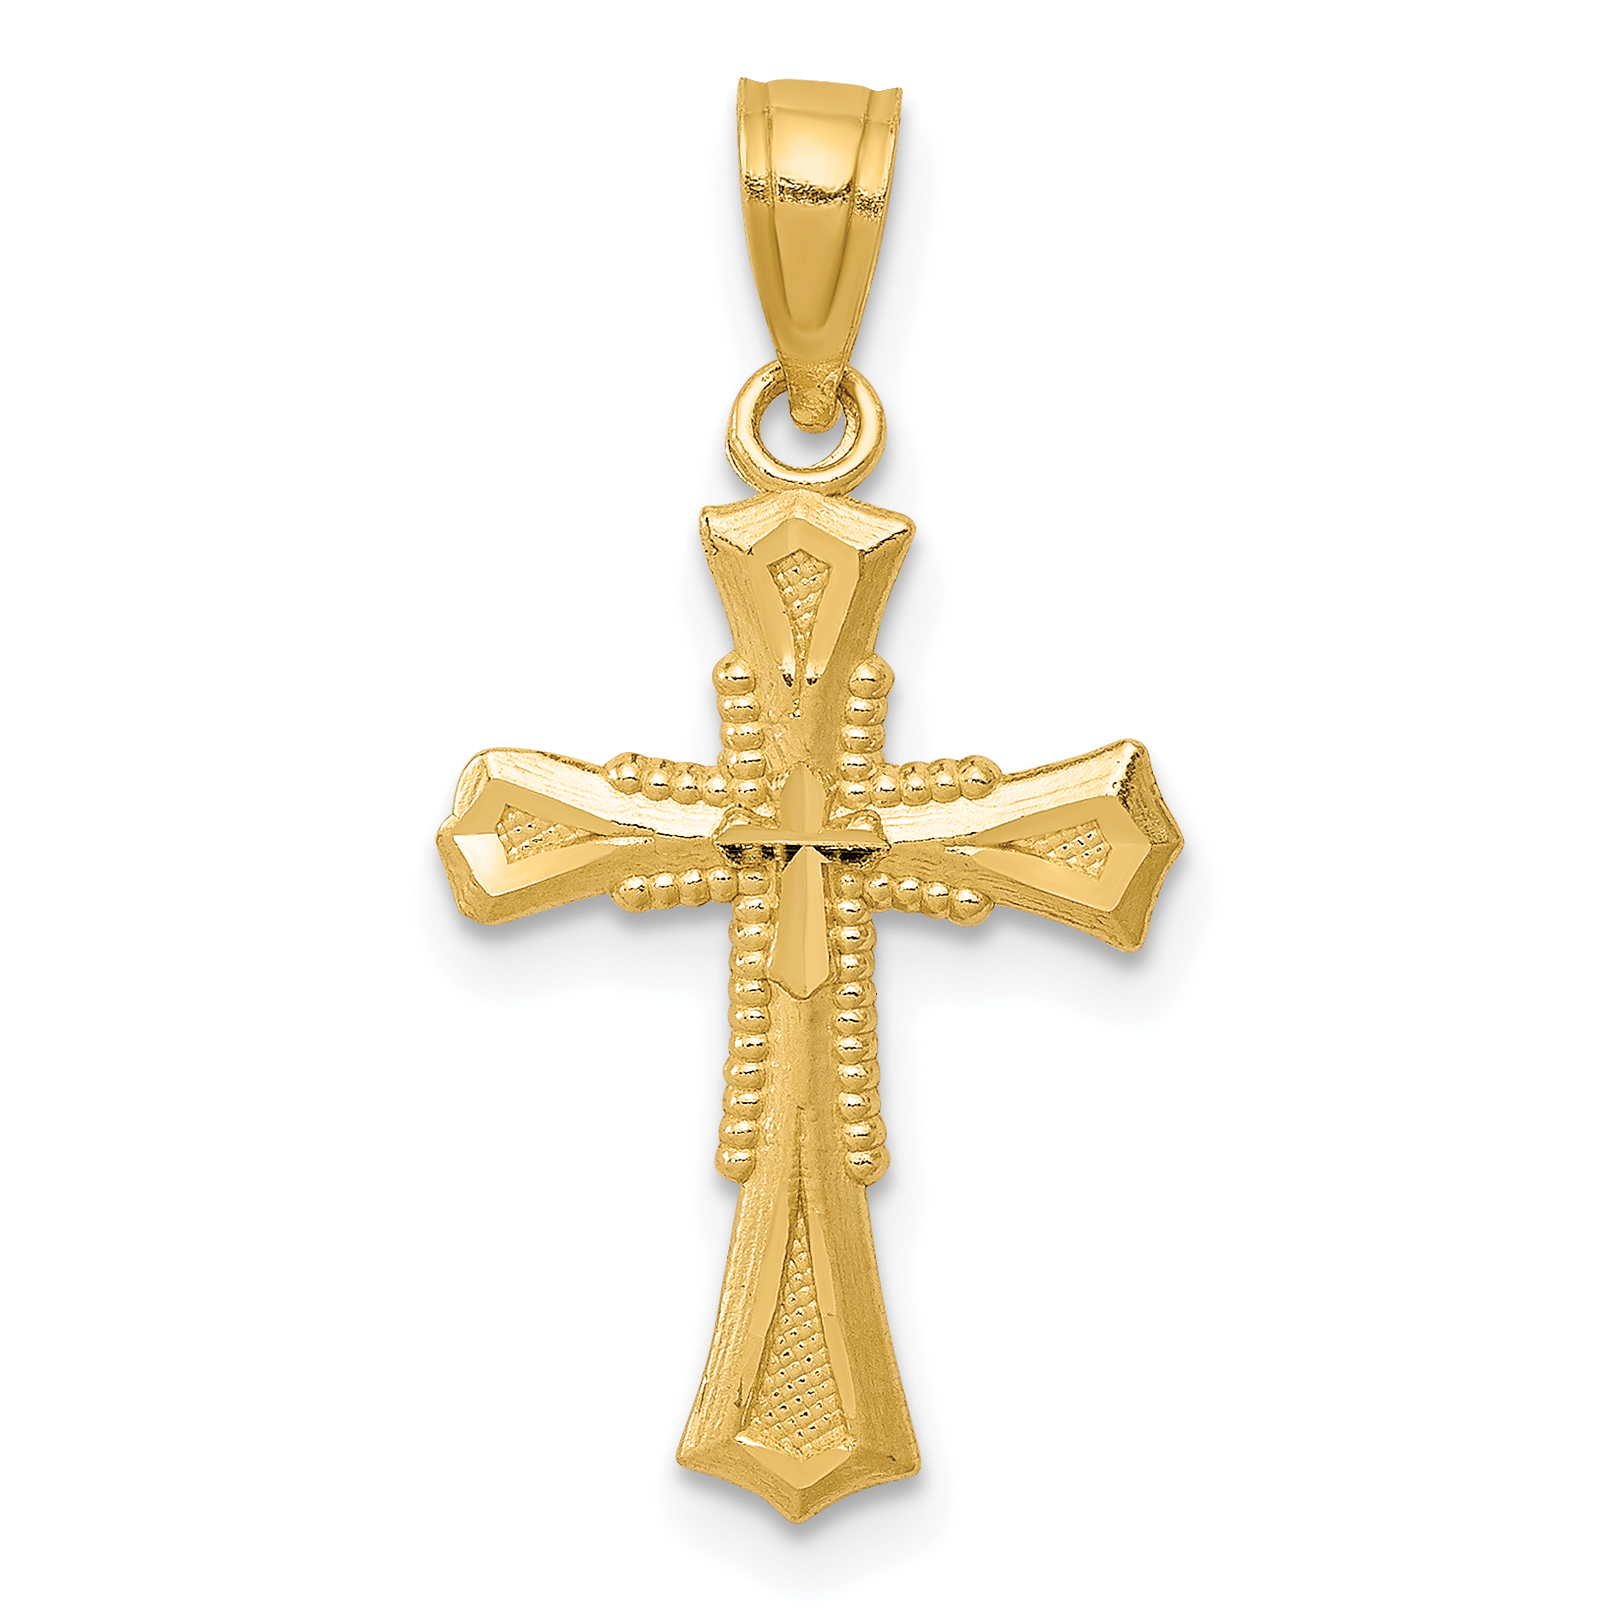 Polished 14k Yellow Gold Fleur de Lis Cross Charm Pendant